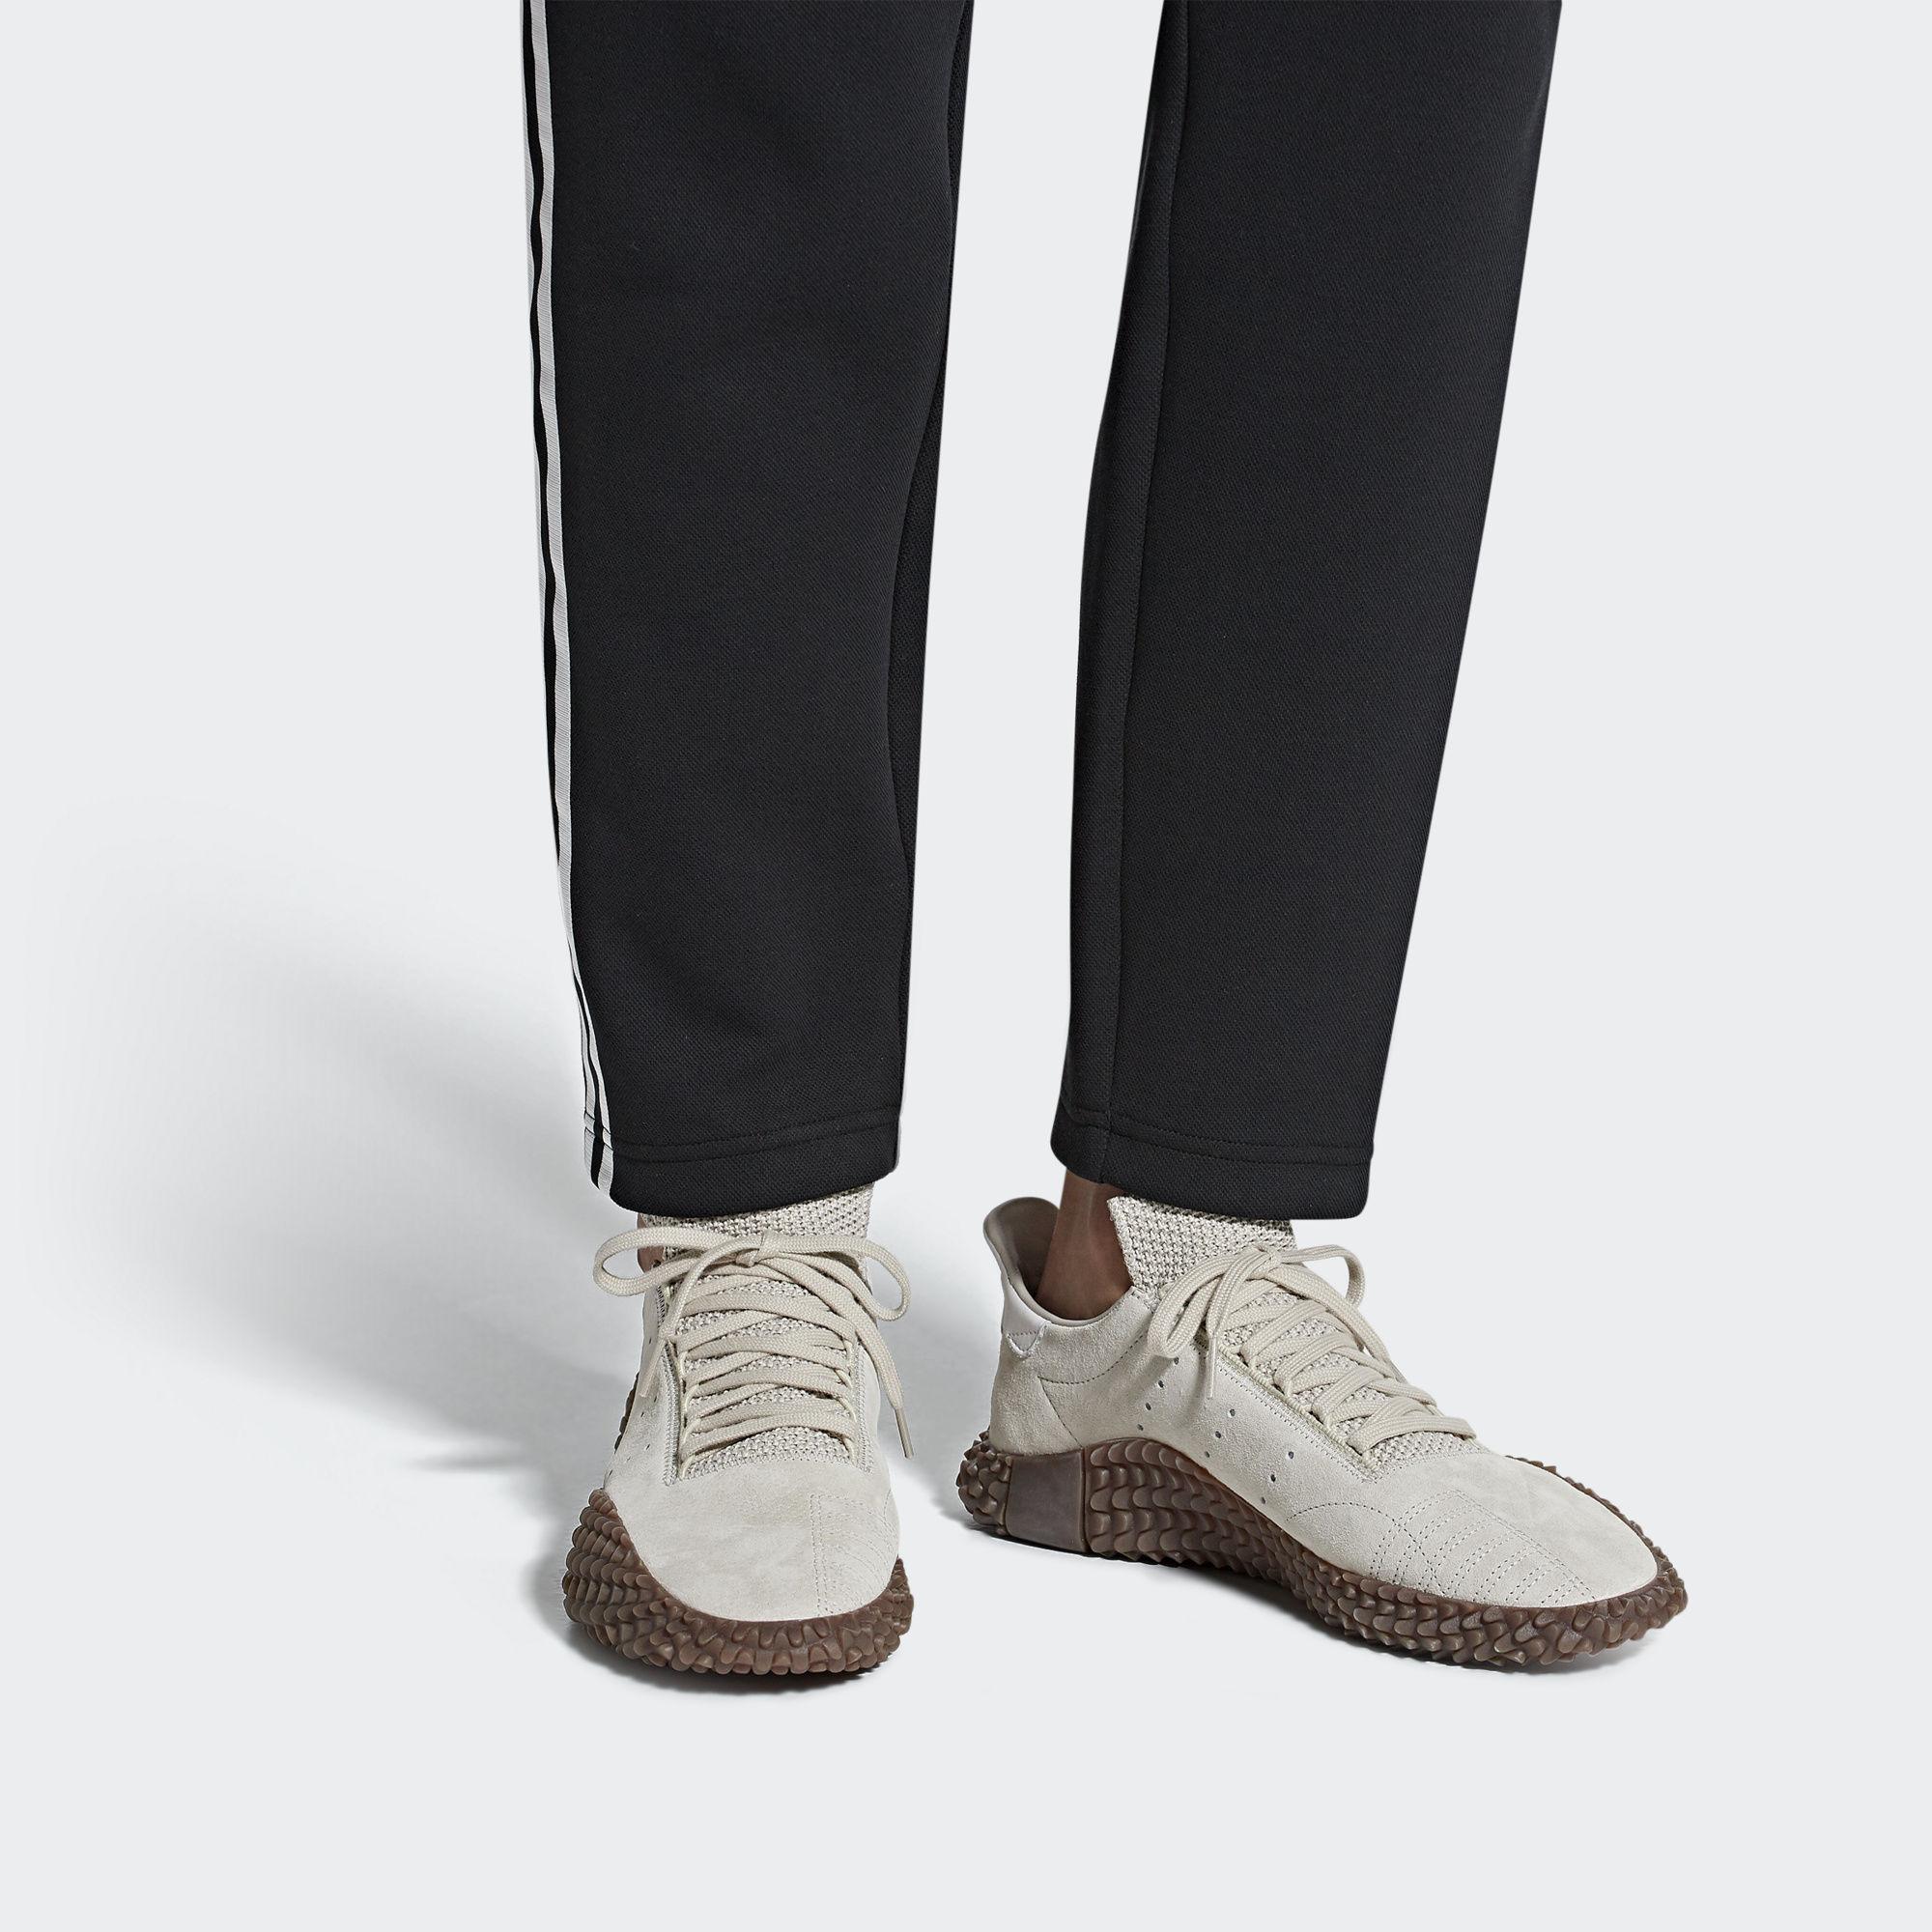 Kamanda 01 Shoes shop 25 70%   Gratis retourneren   Afound